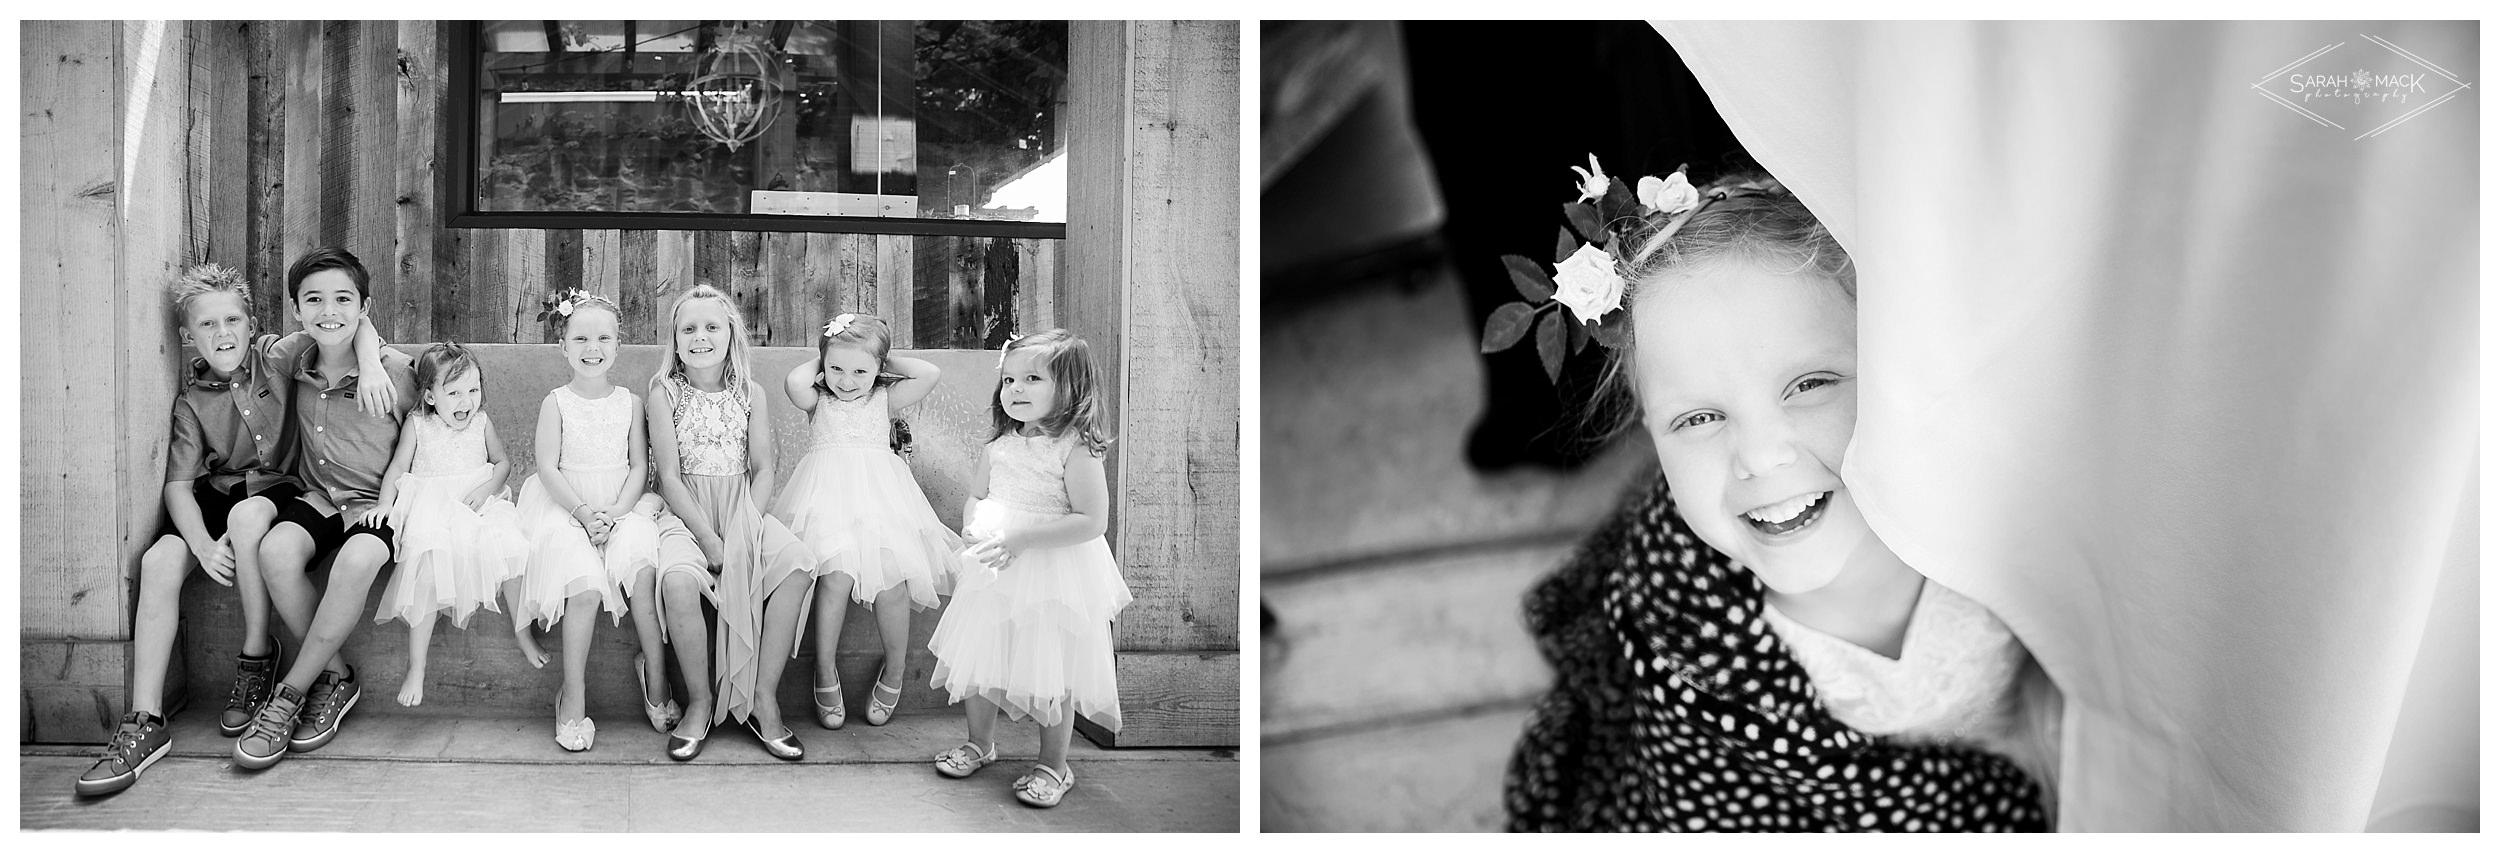 LM-Newport-Beach-Pier-Intimate-Wedding-Photography 200-2.jpg